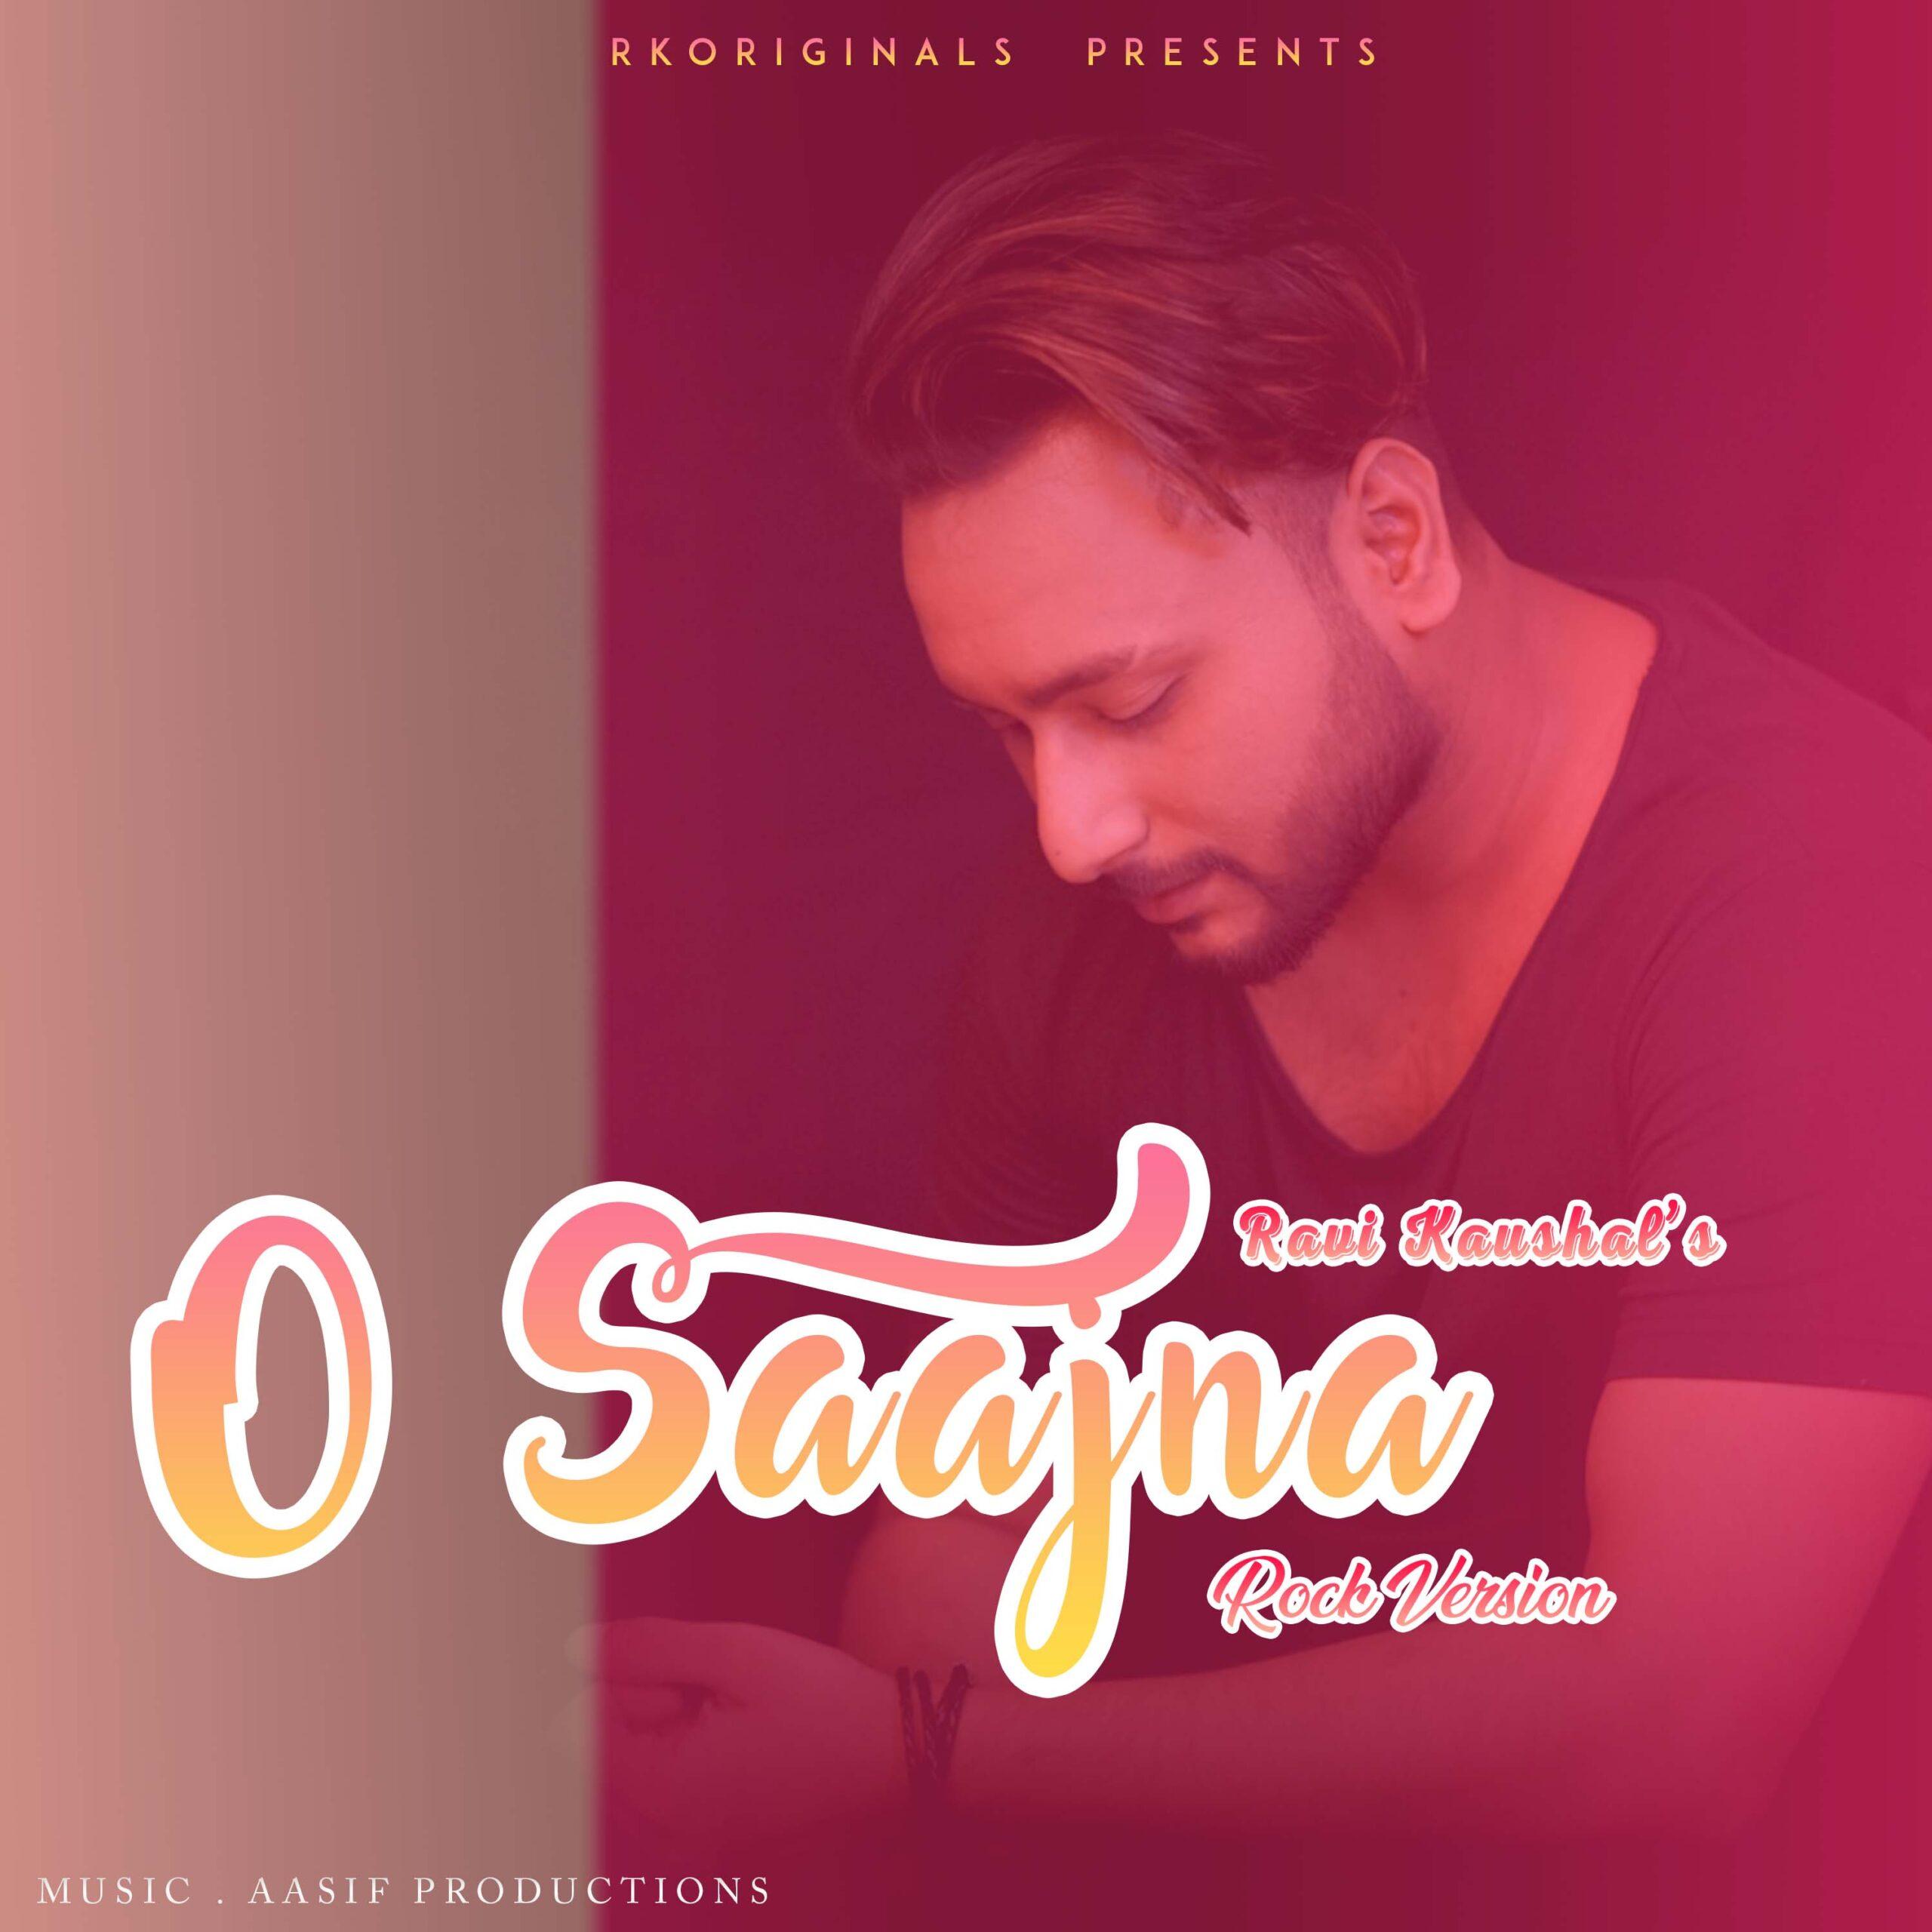 O Saajna (Rock) - Ravi Kaushal